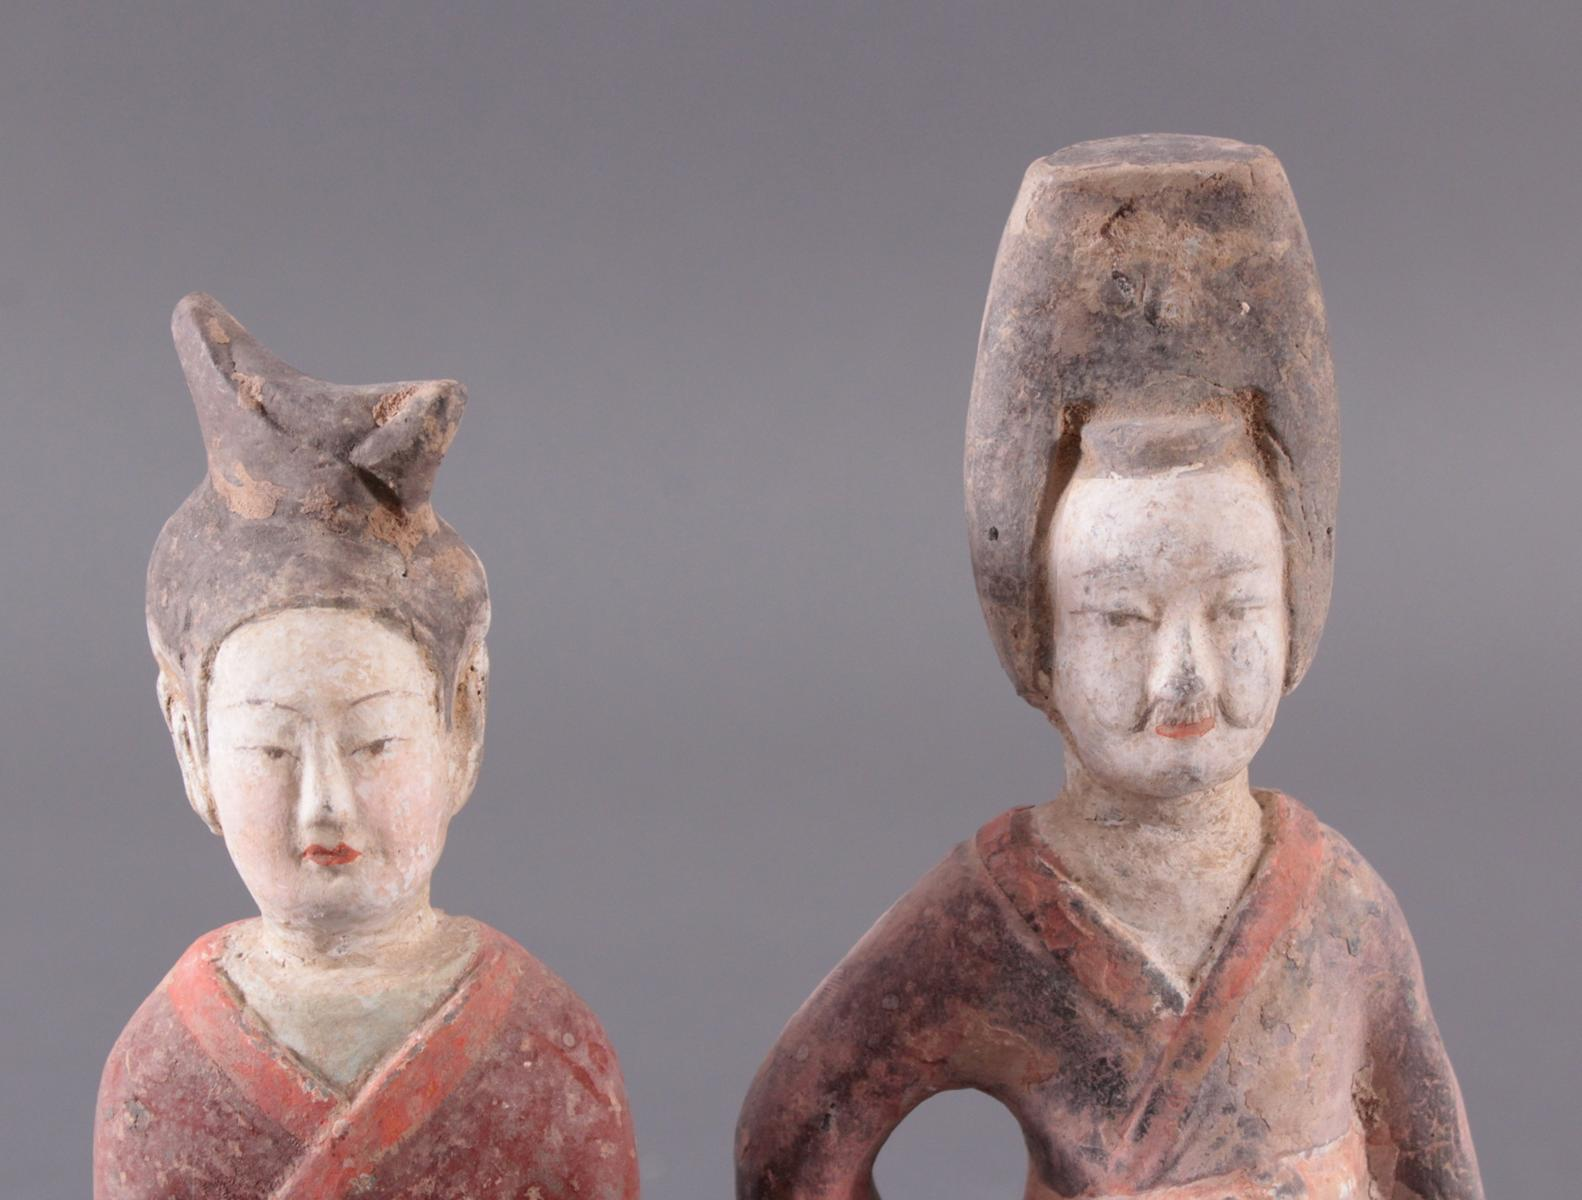 China TANG-Dynastie, 2 Figuren aus Ton-5